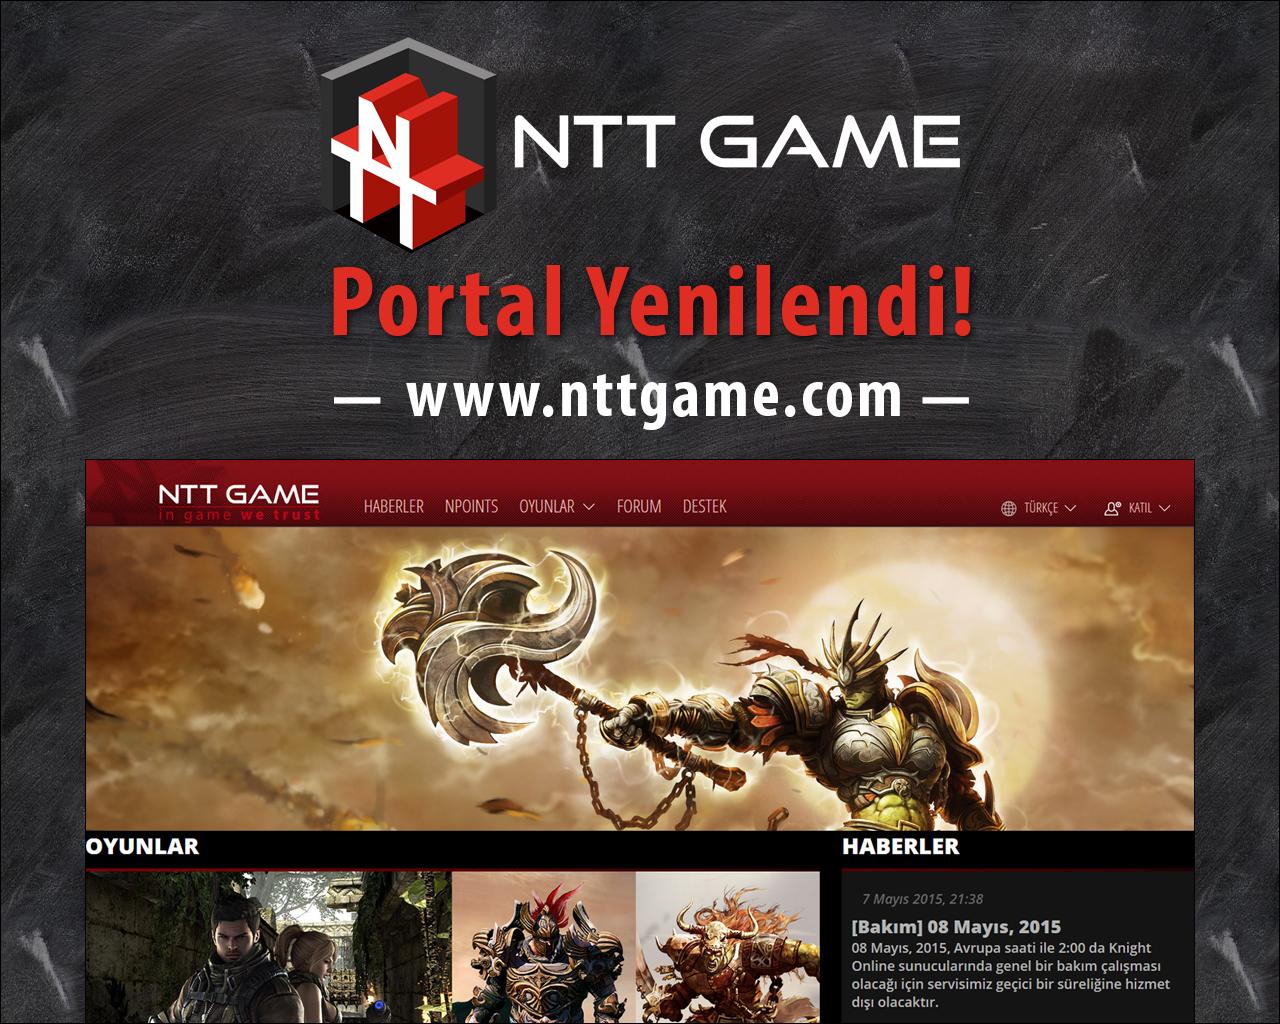 NTT GAME RESMİ SİTESİ YENİLENDİ!